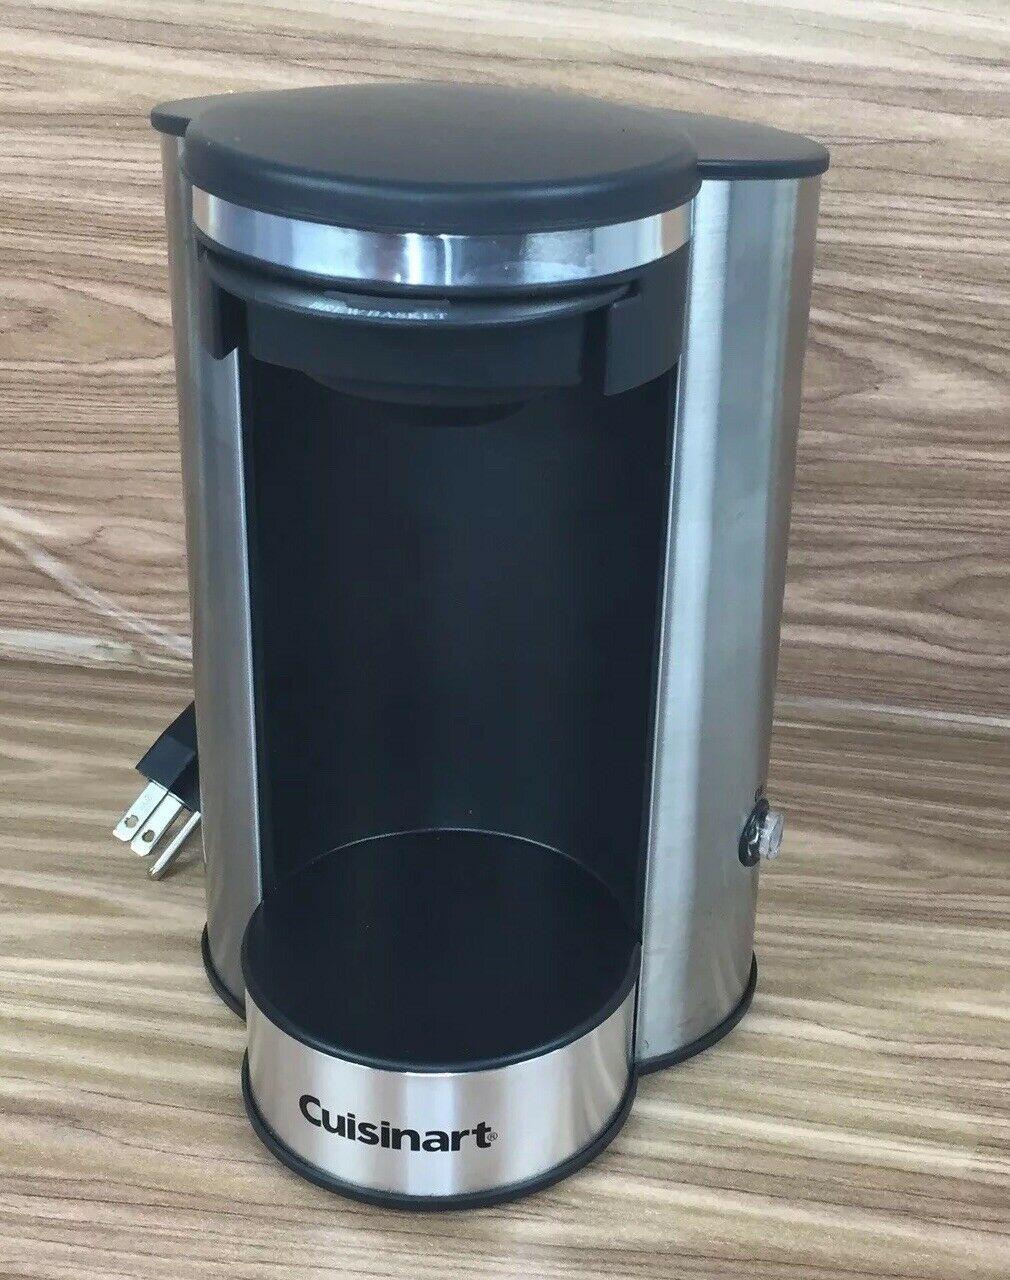 Cuisinart W1cm5s 1 Cup Stainless Steel Brewer 40072009952 Ebay In 2020 Single Coffee Maker Cuisinart Single Cup Coffee Maker